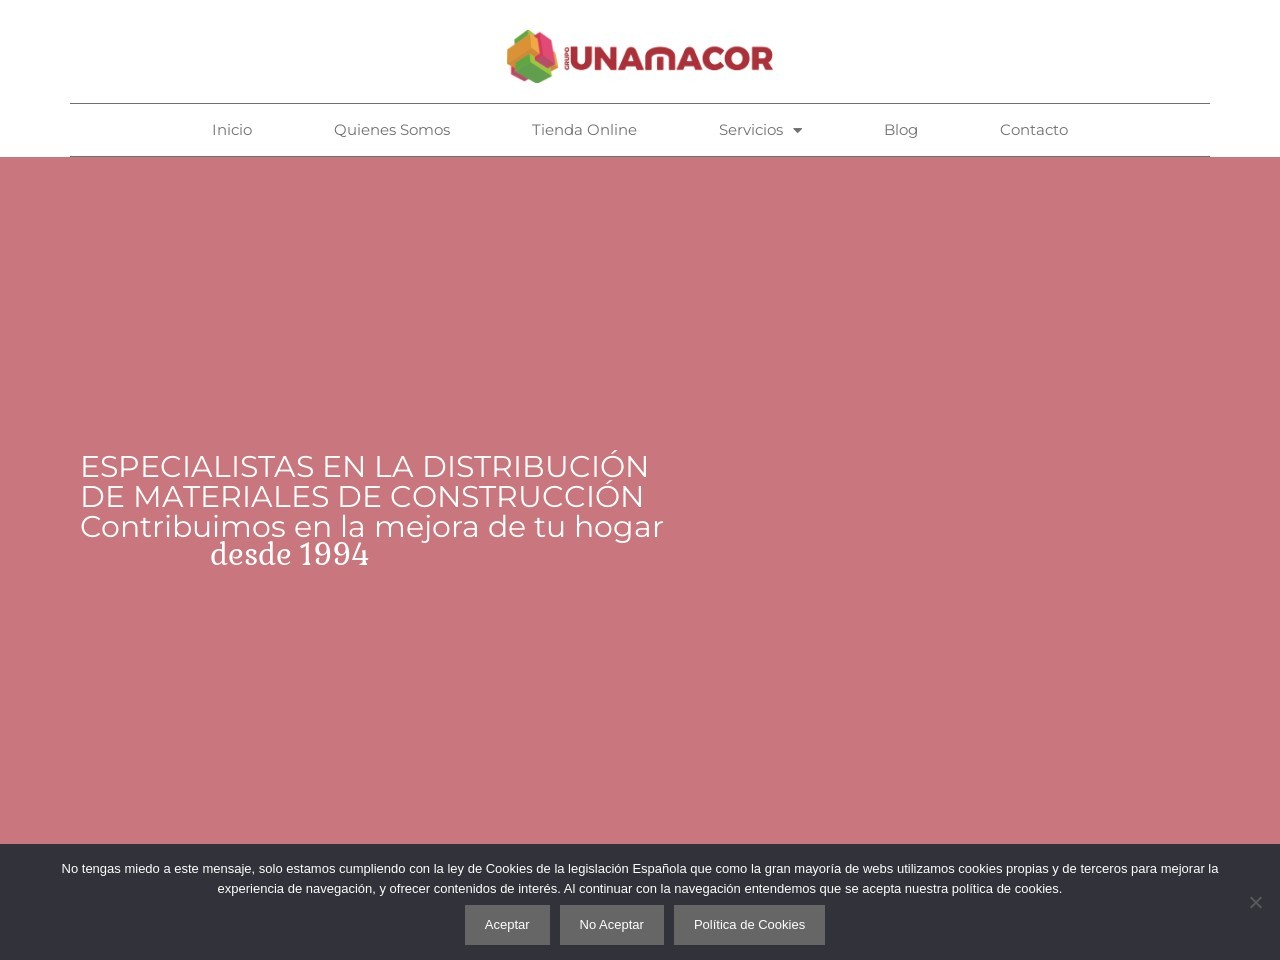 grupounamacor.com